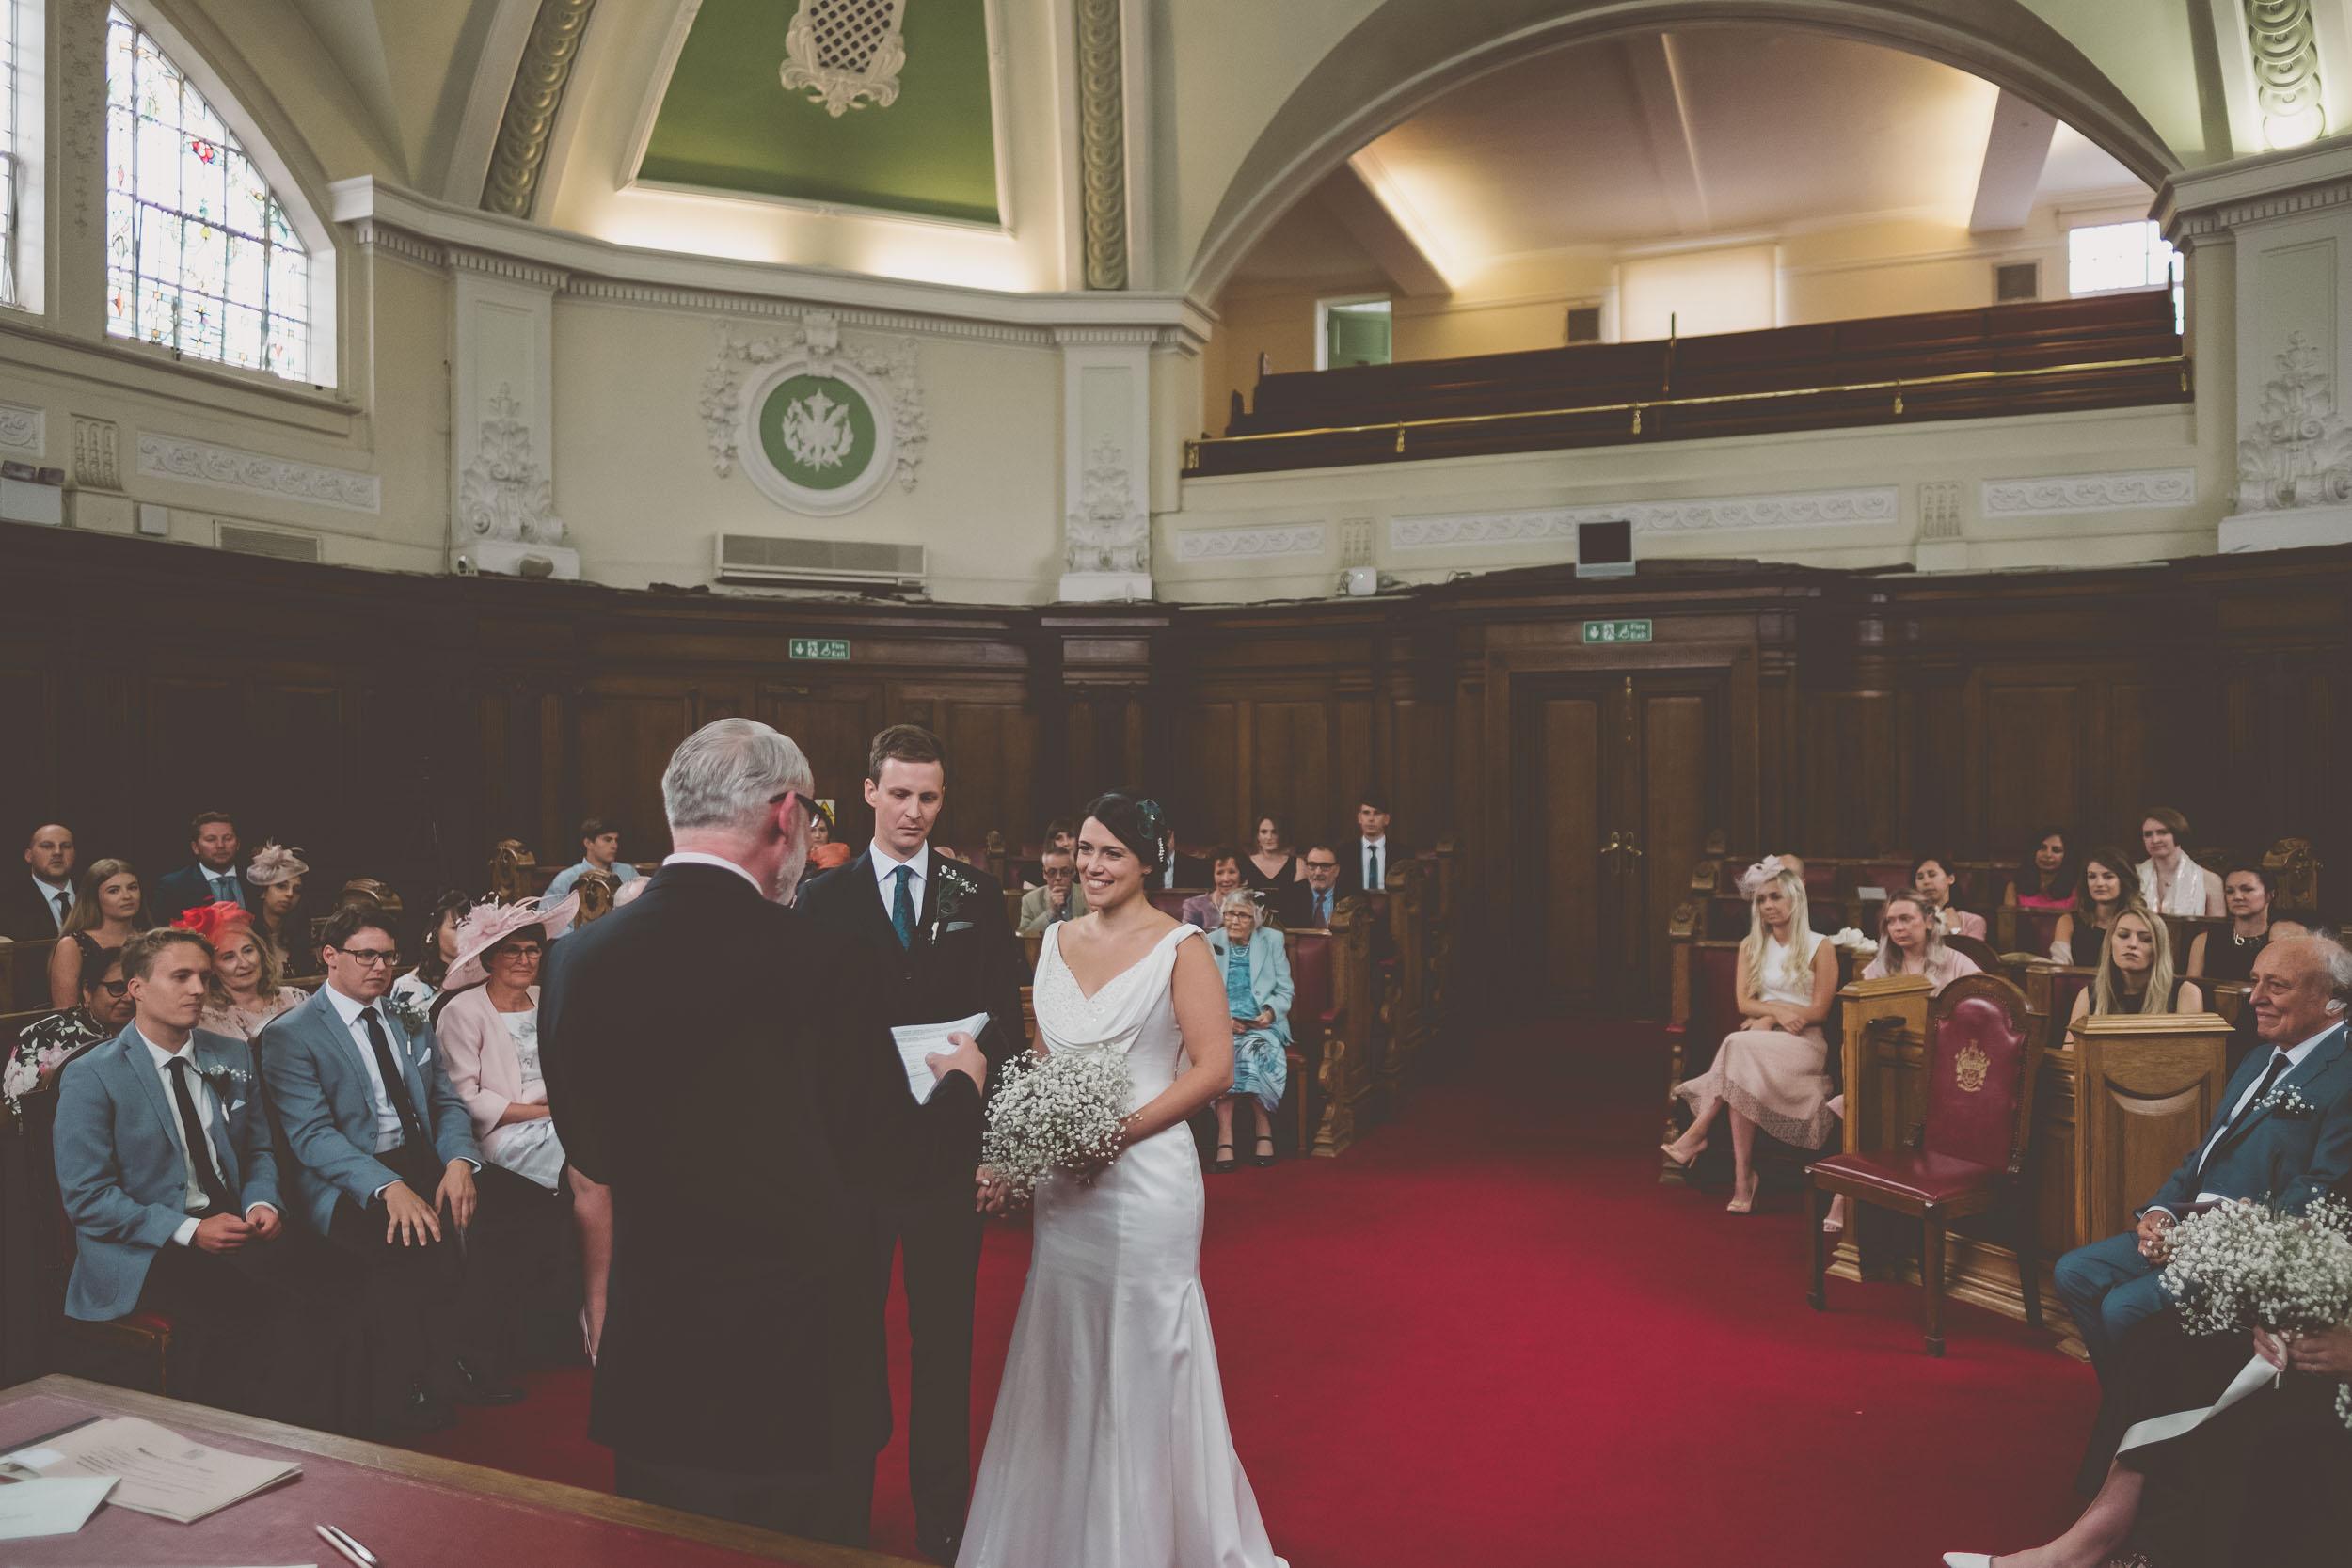 islington-town-hall-4th-floor-studios-wedding070.jpg